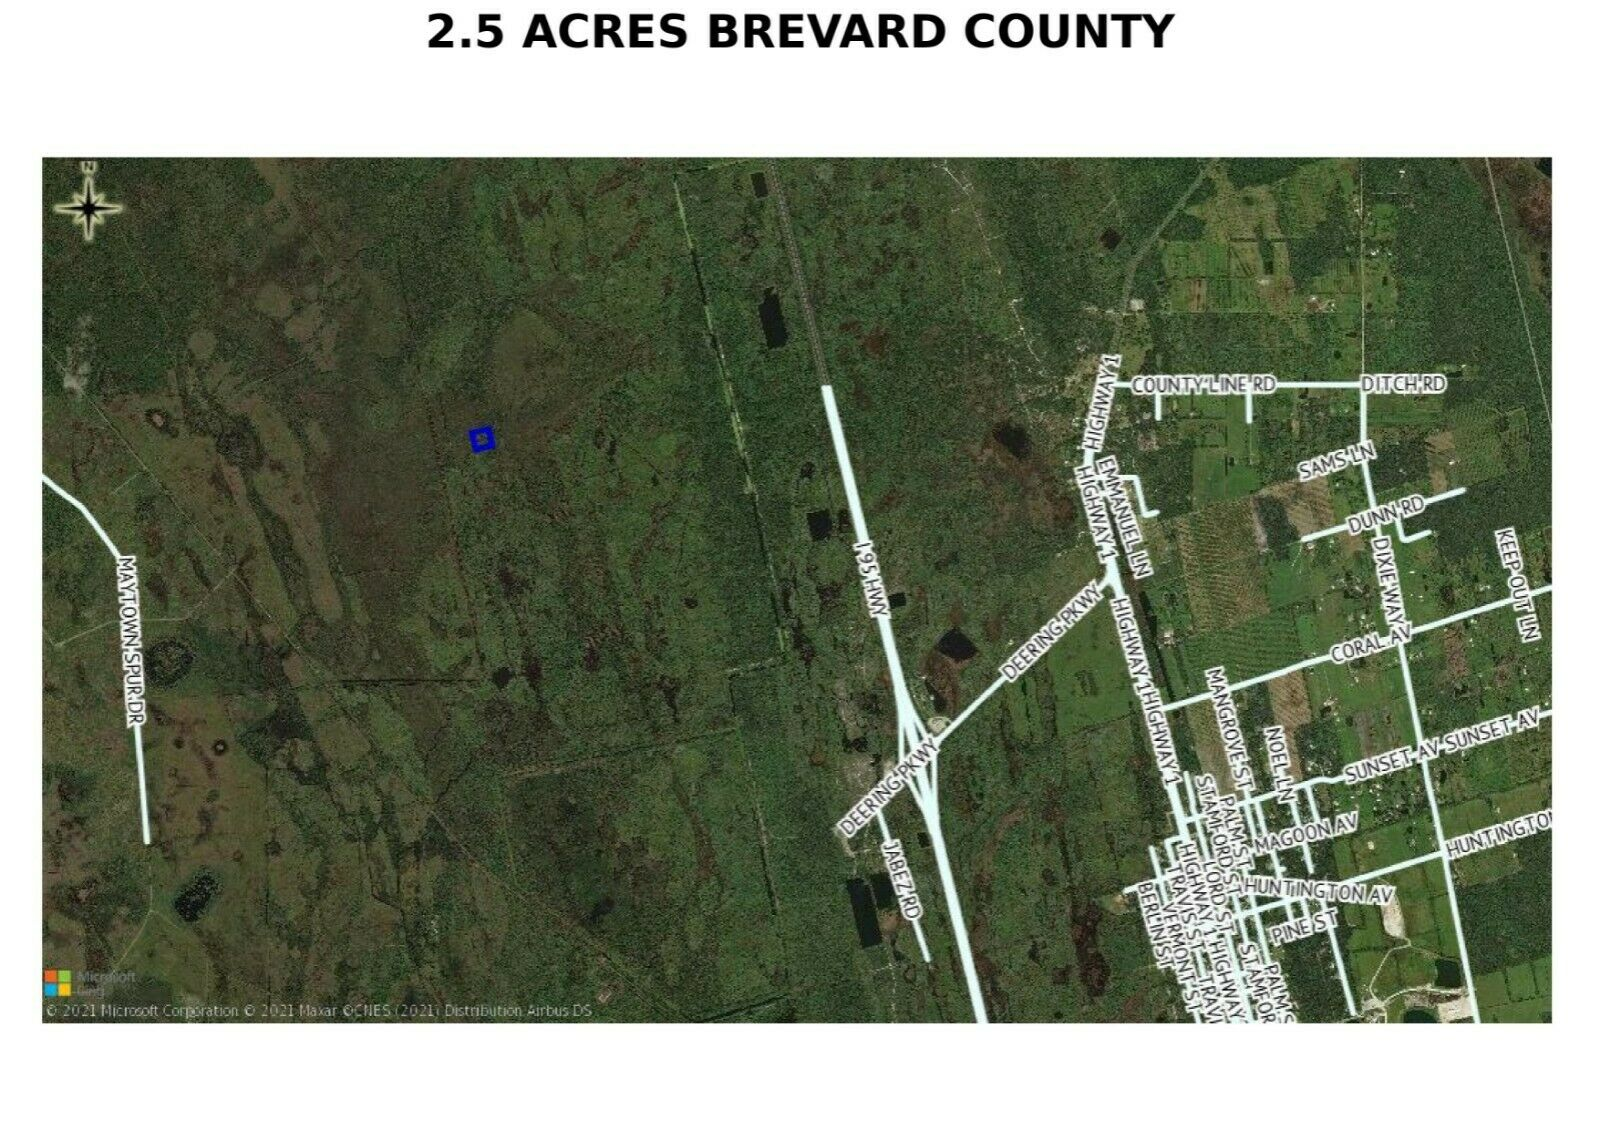 PRE-FORECLOSURE FLORIDA TAX LIEN CERTIFICATE FOR LAND 2.50 AC COCOA, FL BREVARD - $0.99